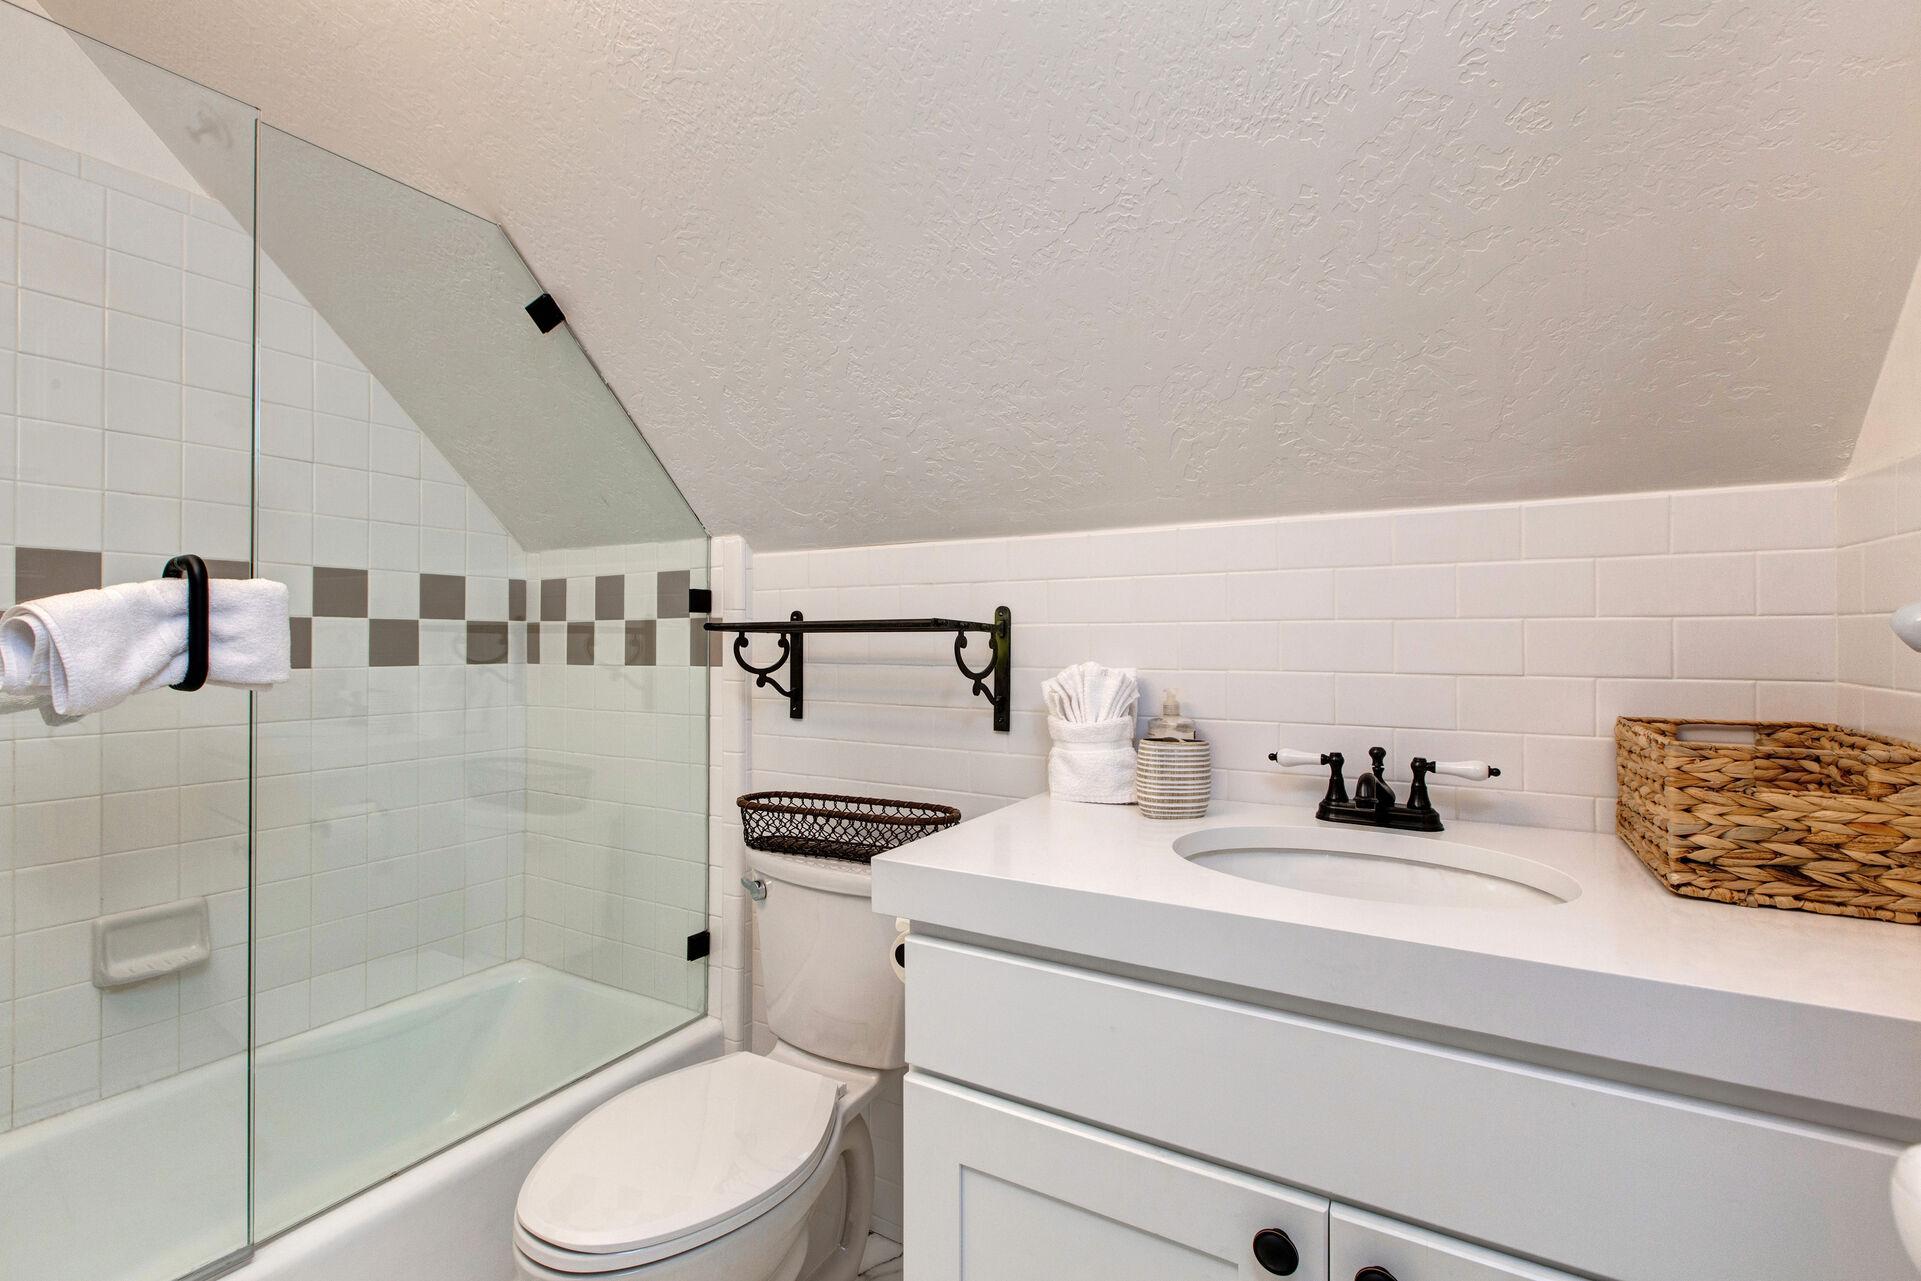 Full Shared Bath